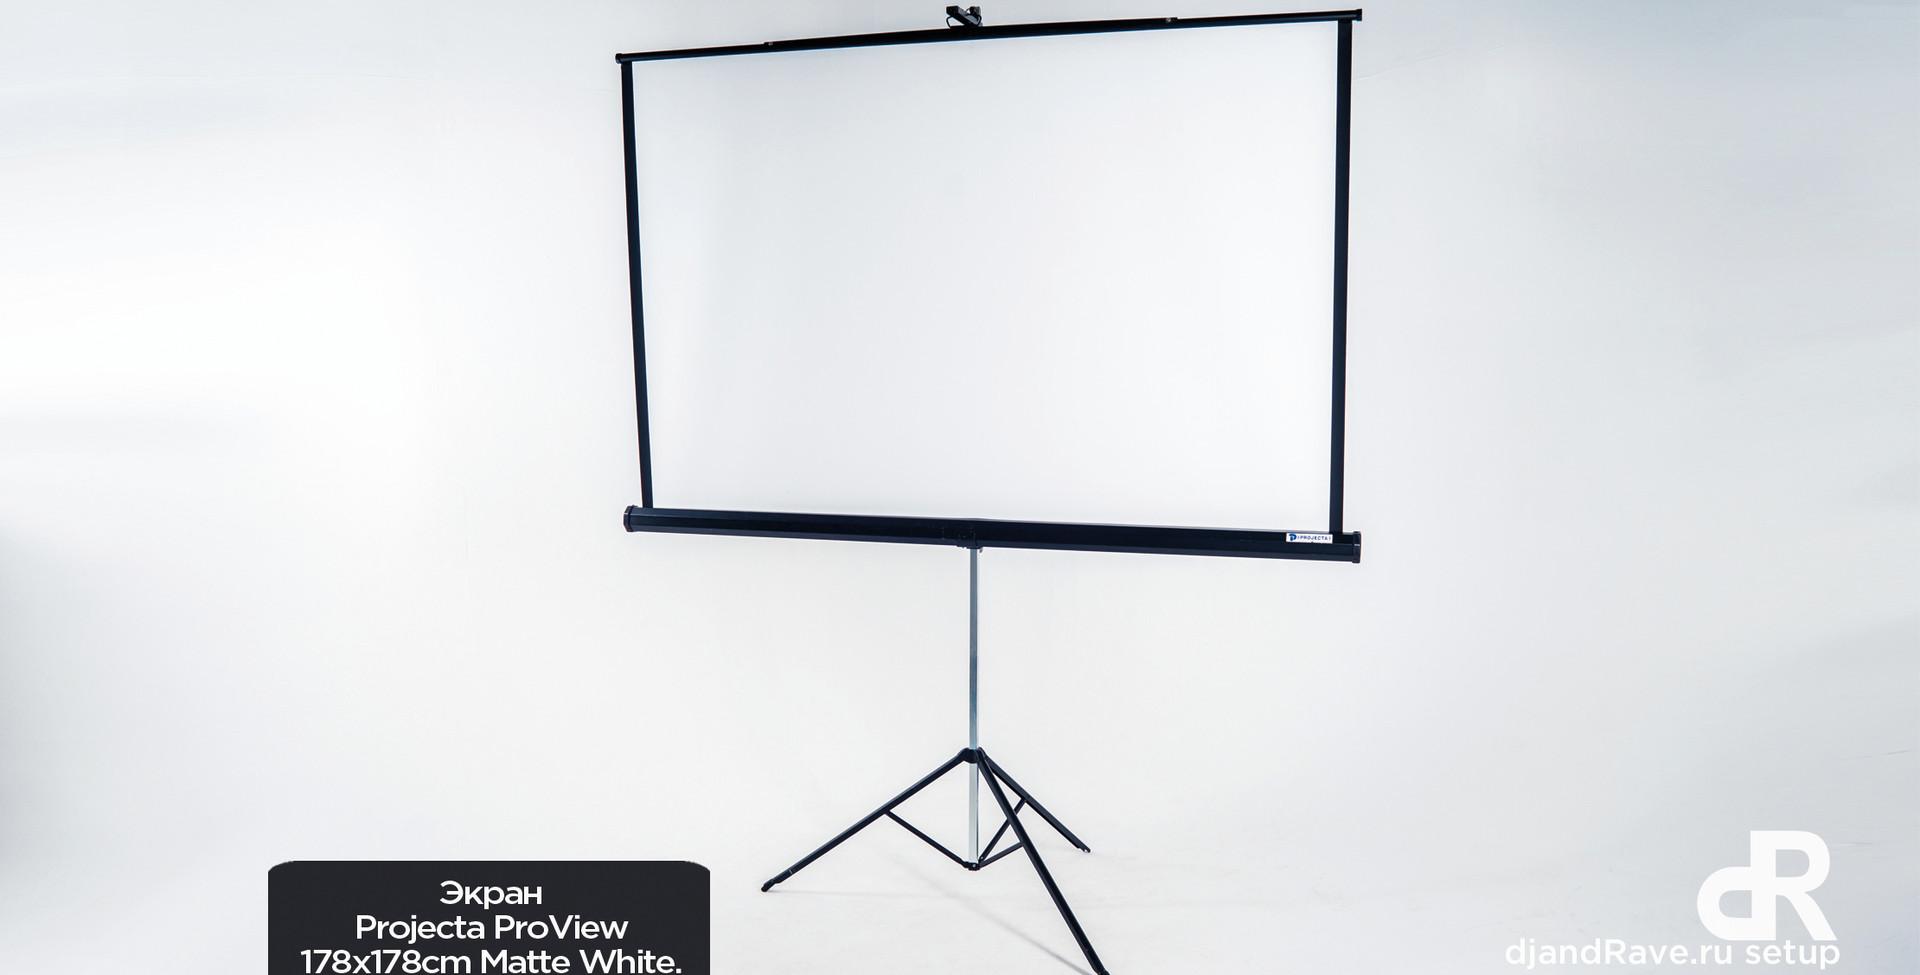 dj-andRave-setup-projecta-L.jpg